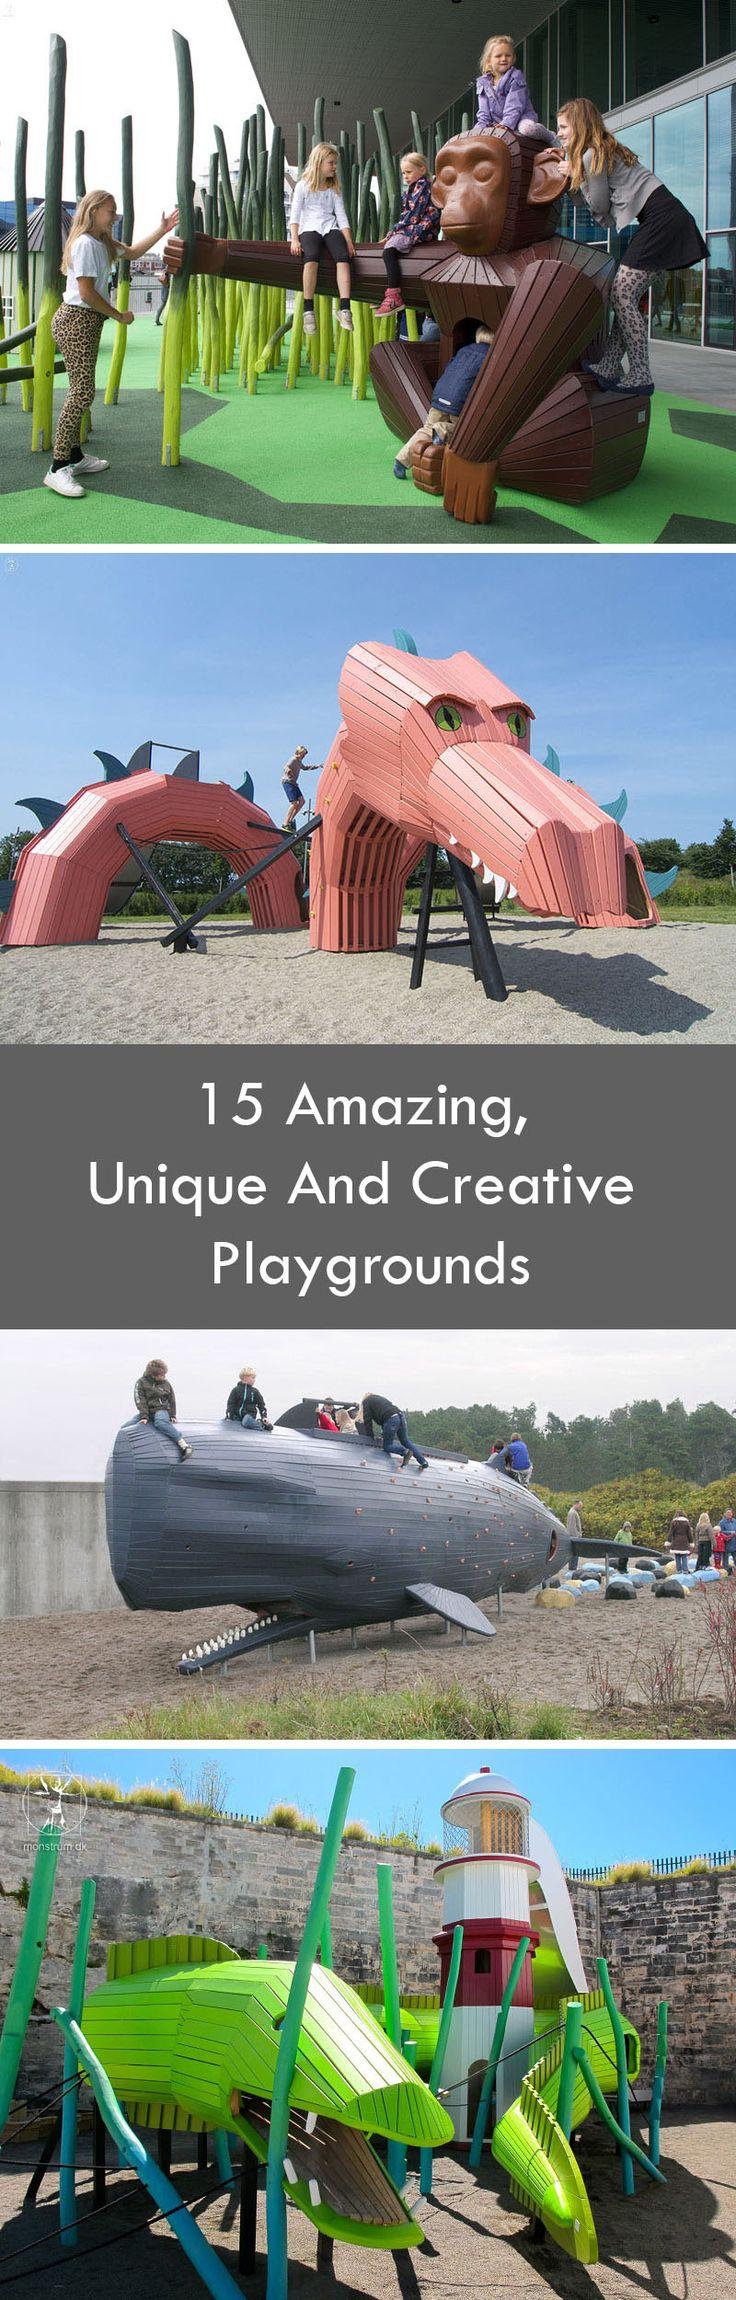 15 Amazing, Unique And Creative Playgrounds